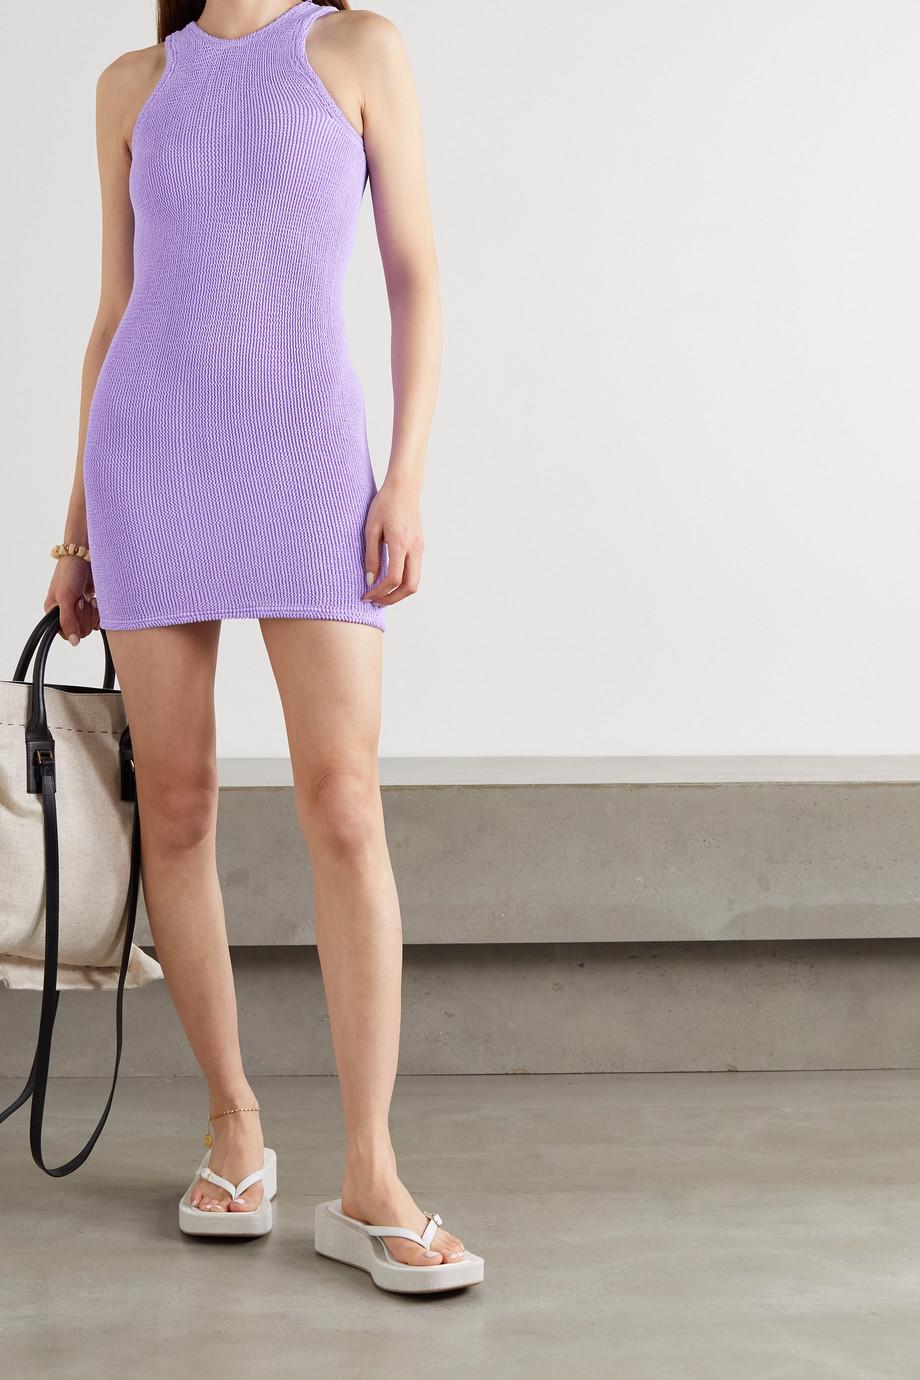 Hunza G + NET SUSTAIN Iris Minikleid aus Seersucker